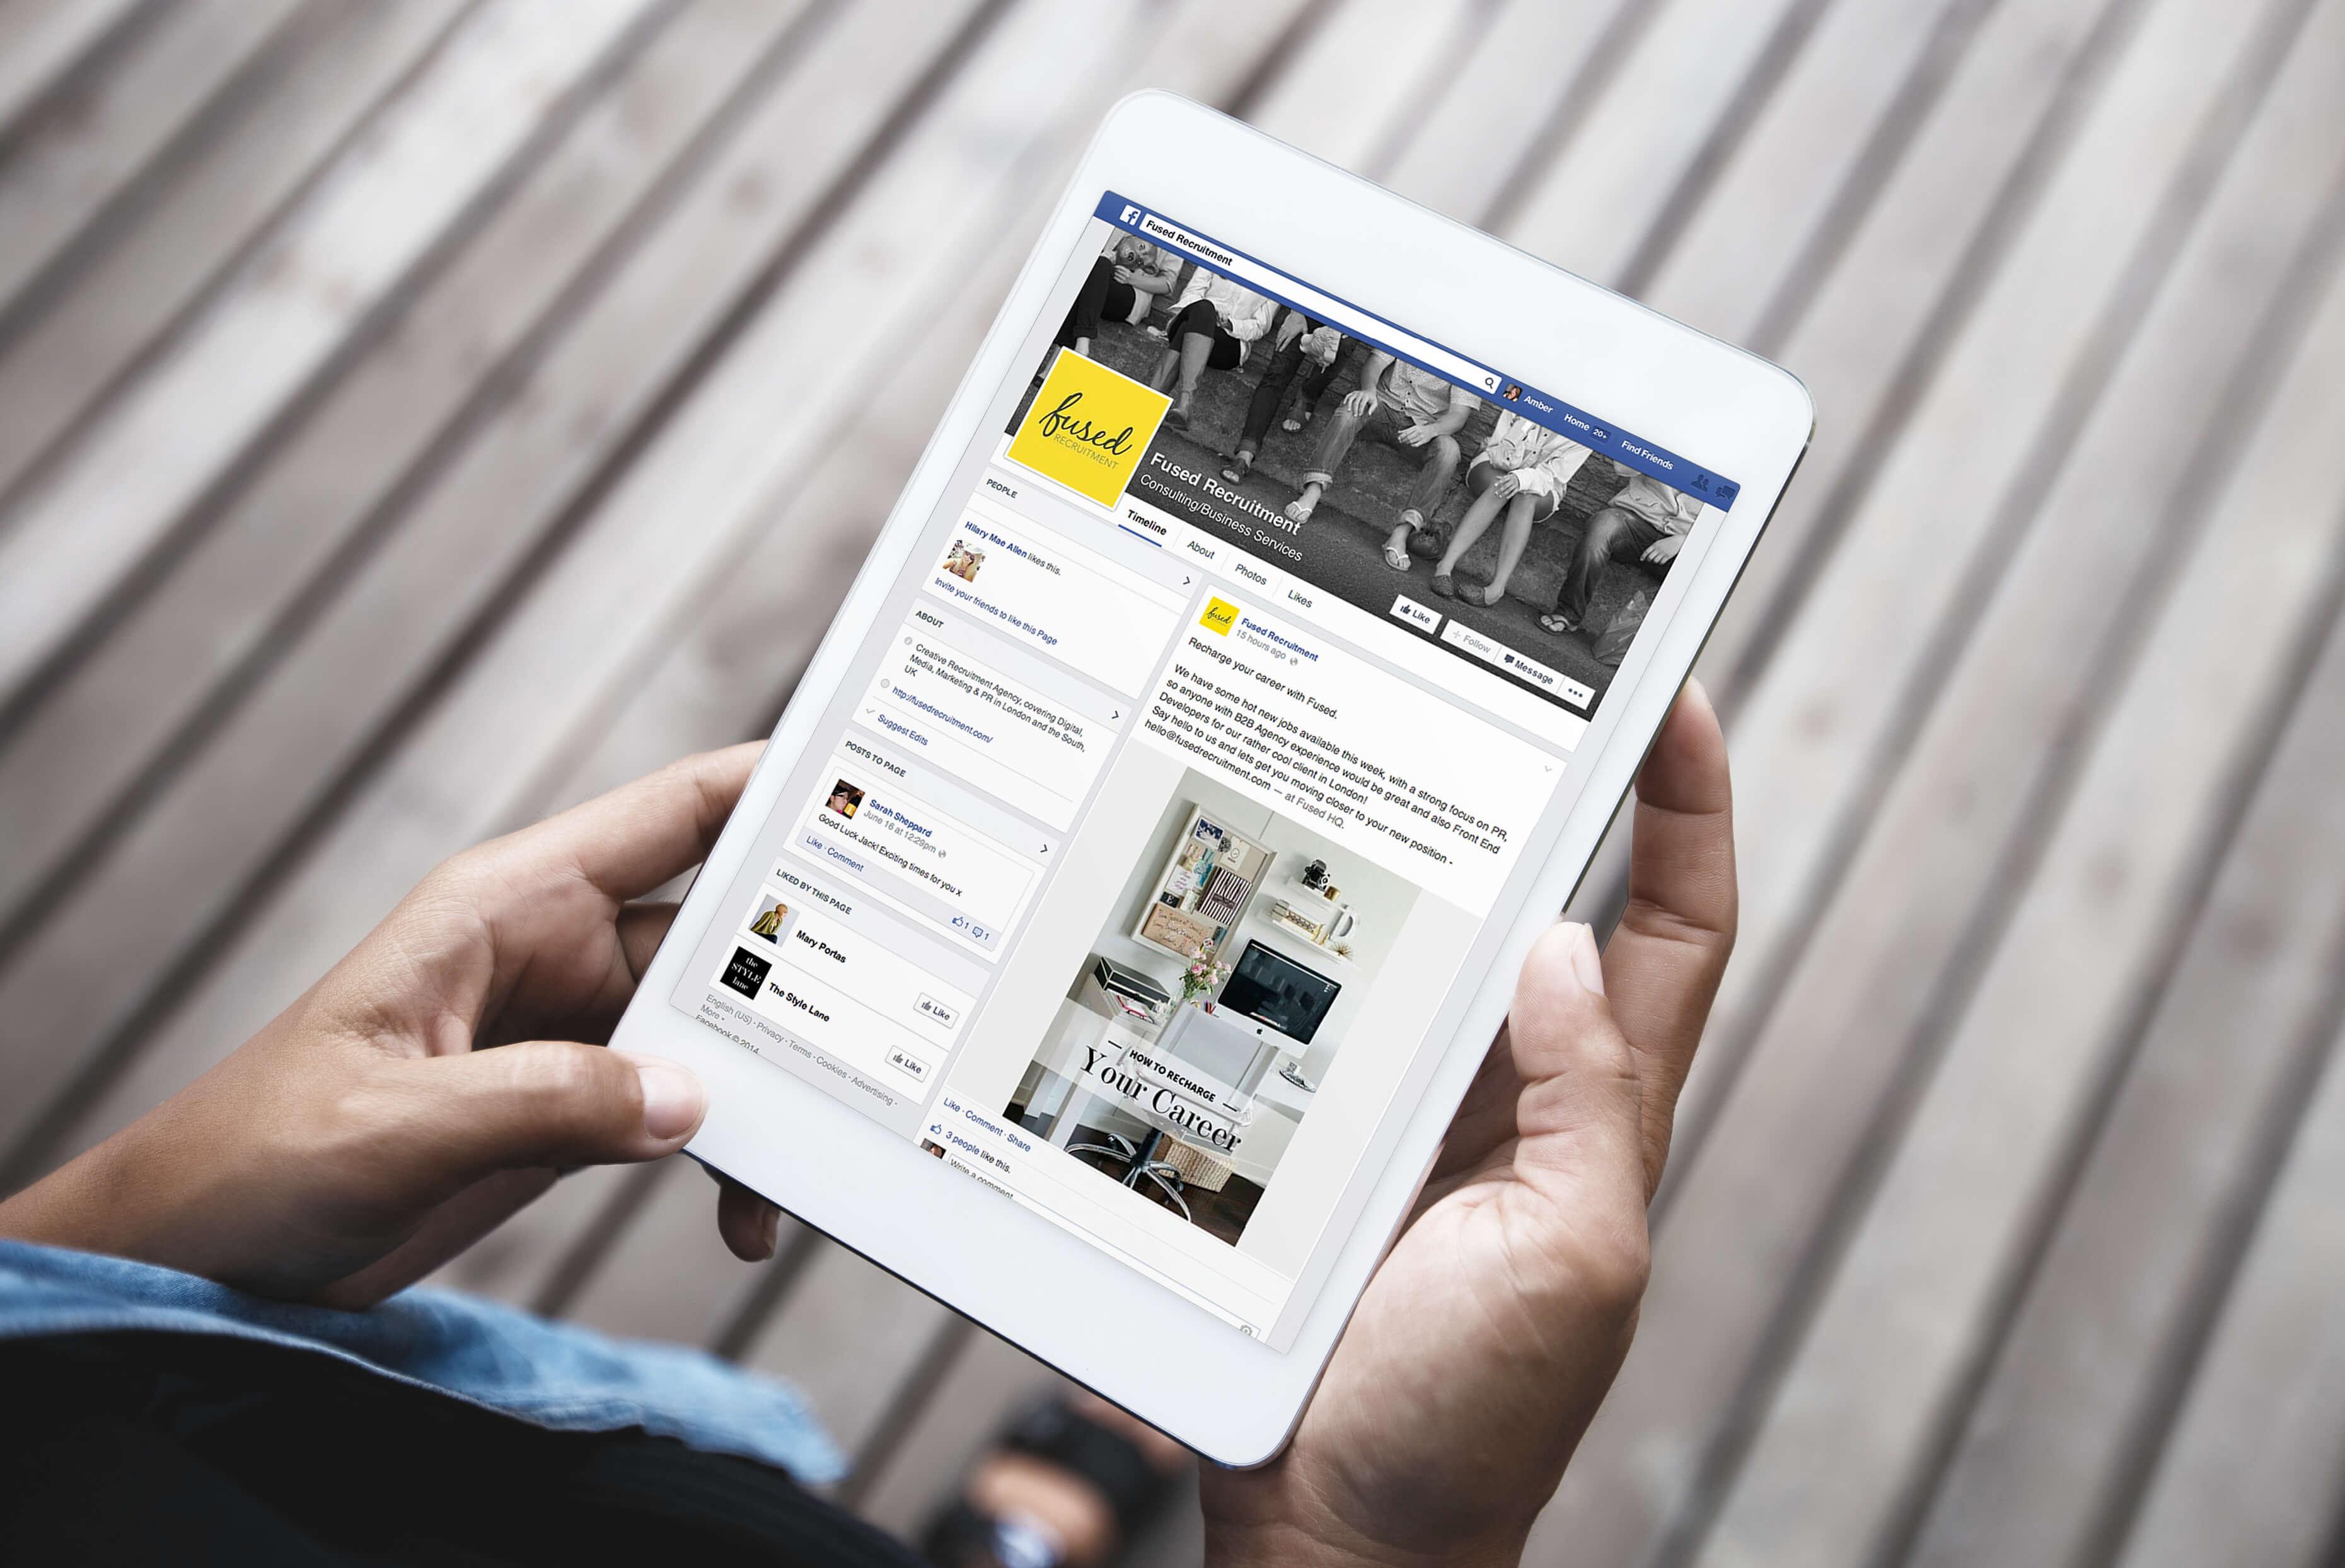 Fused Recruitment Facebook | Fused Recruitment Branding | Independent Marketing - IM London | London Branding Agency